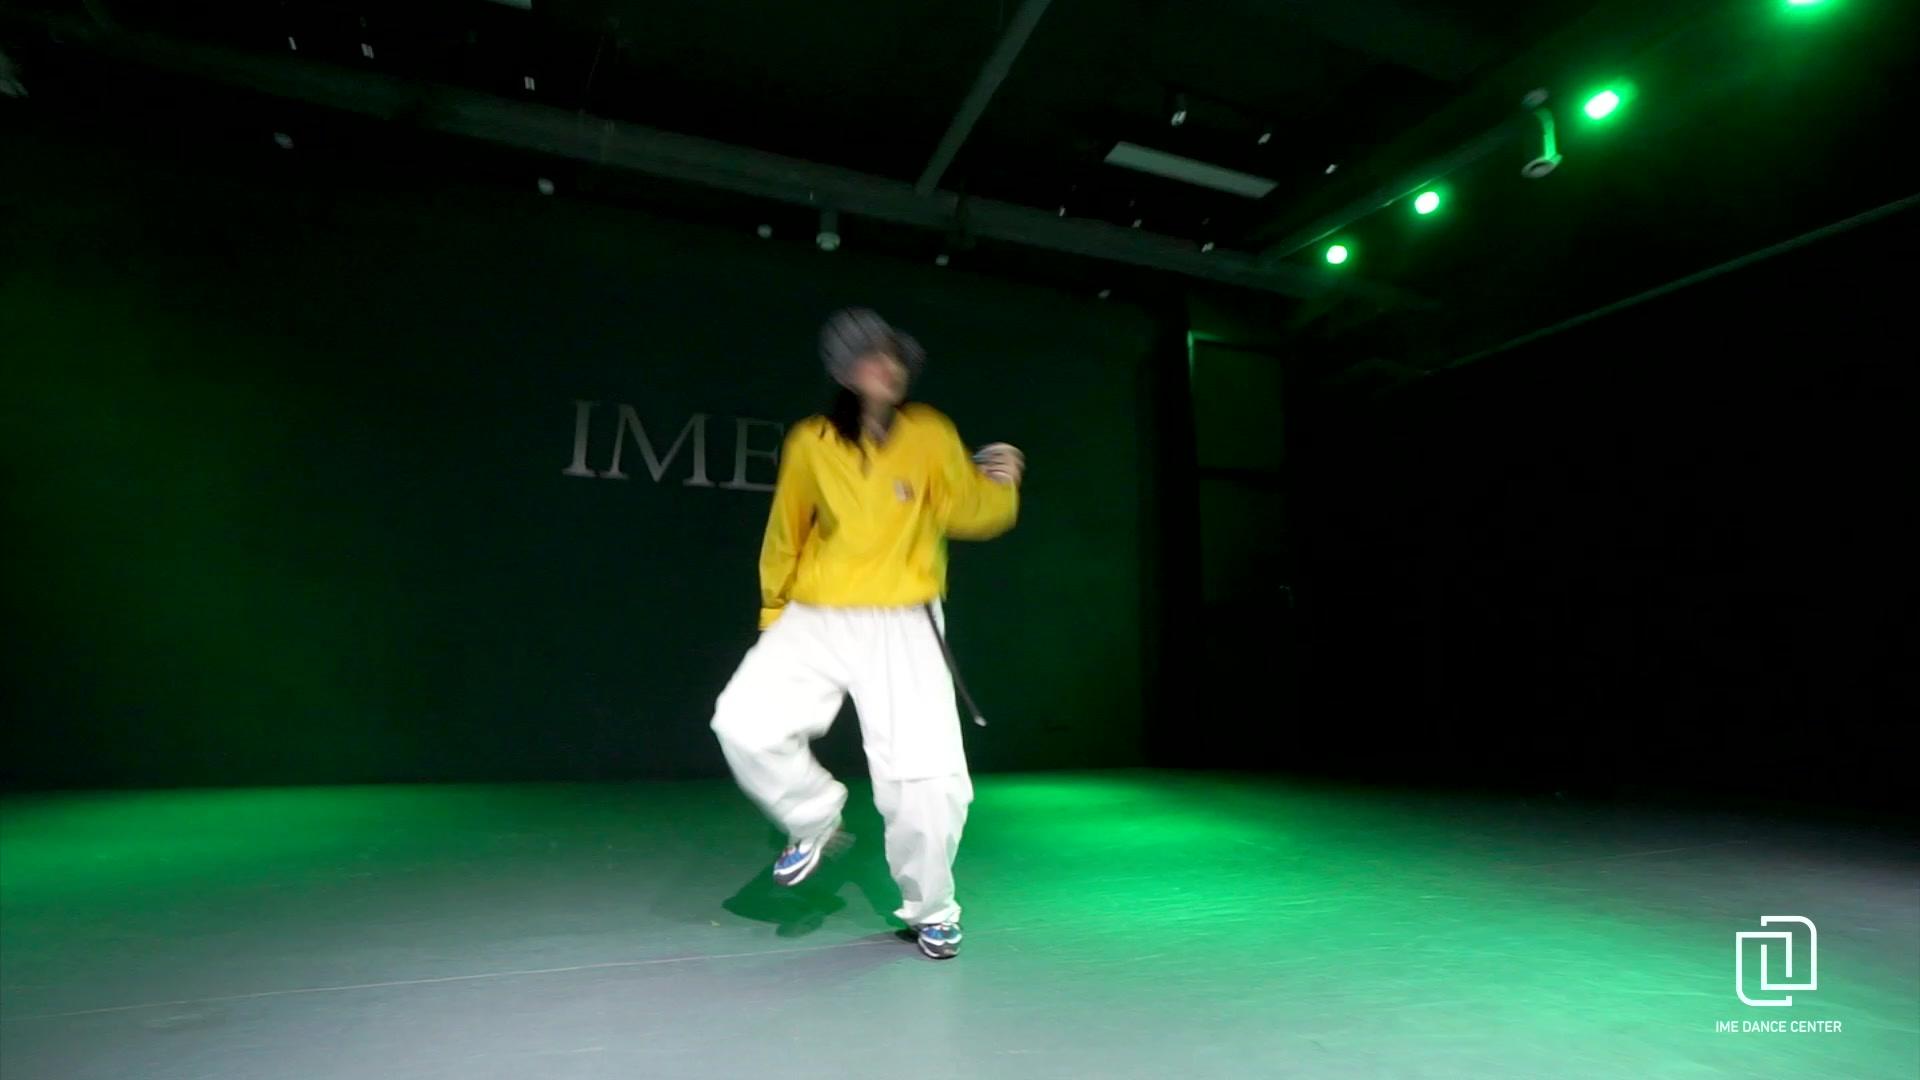 lunar告白舞蹈_【bigbang&权志龙】串烧 男团练习室版 诶嘿嘿帅气【南京IME舞蹈 ...